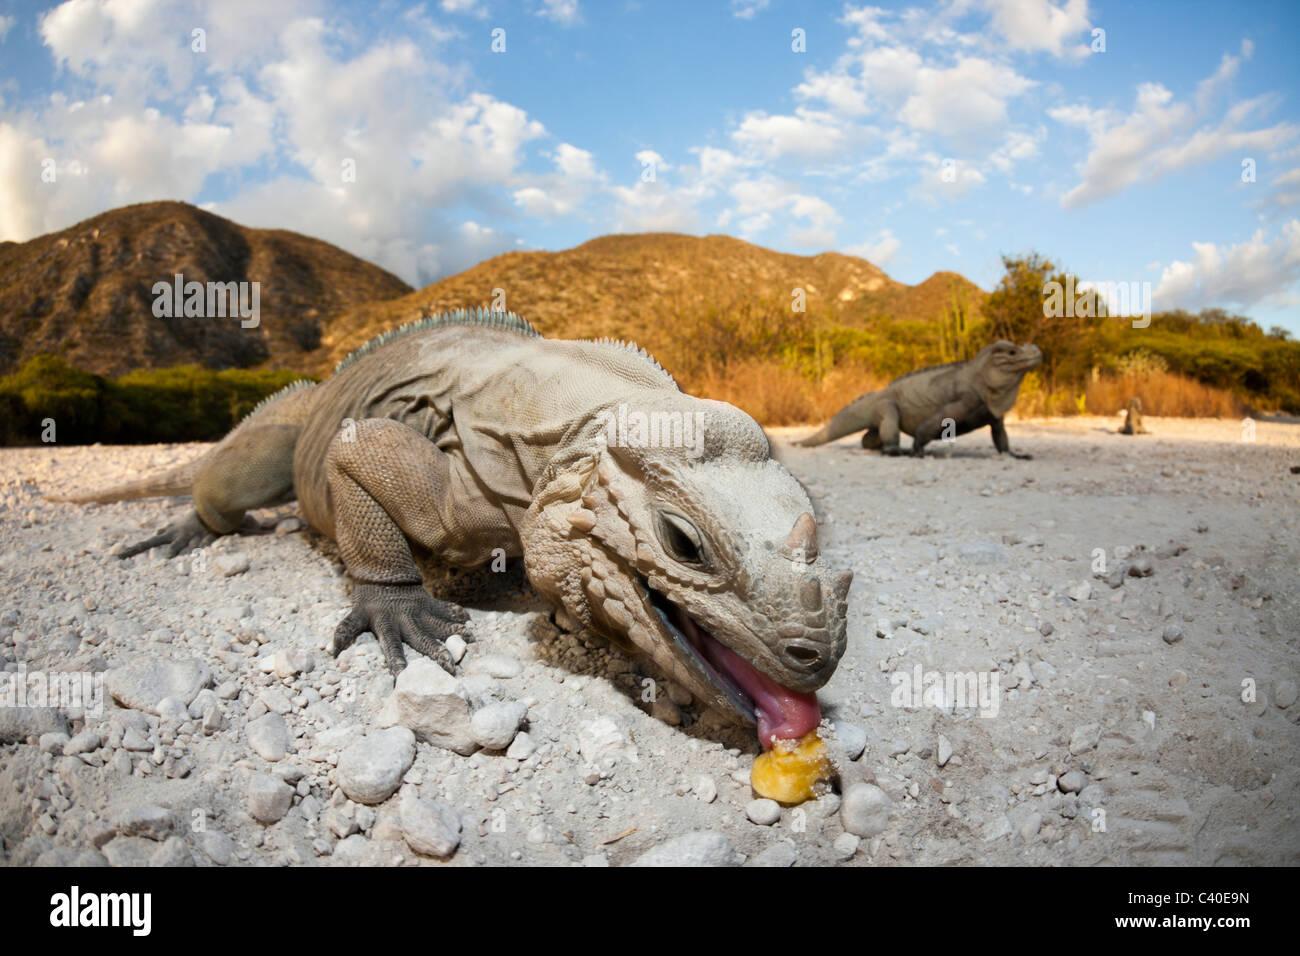 Rhinoceros Iguana, Cyclura cornuta, Isla Cabritos National Park, Lago Enriquillo, Dominican Republic - Stock Image